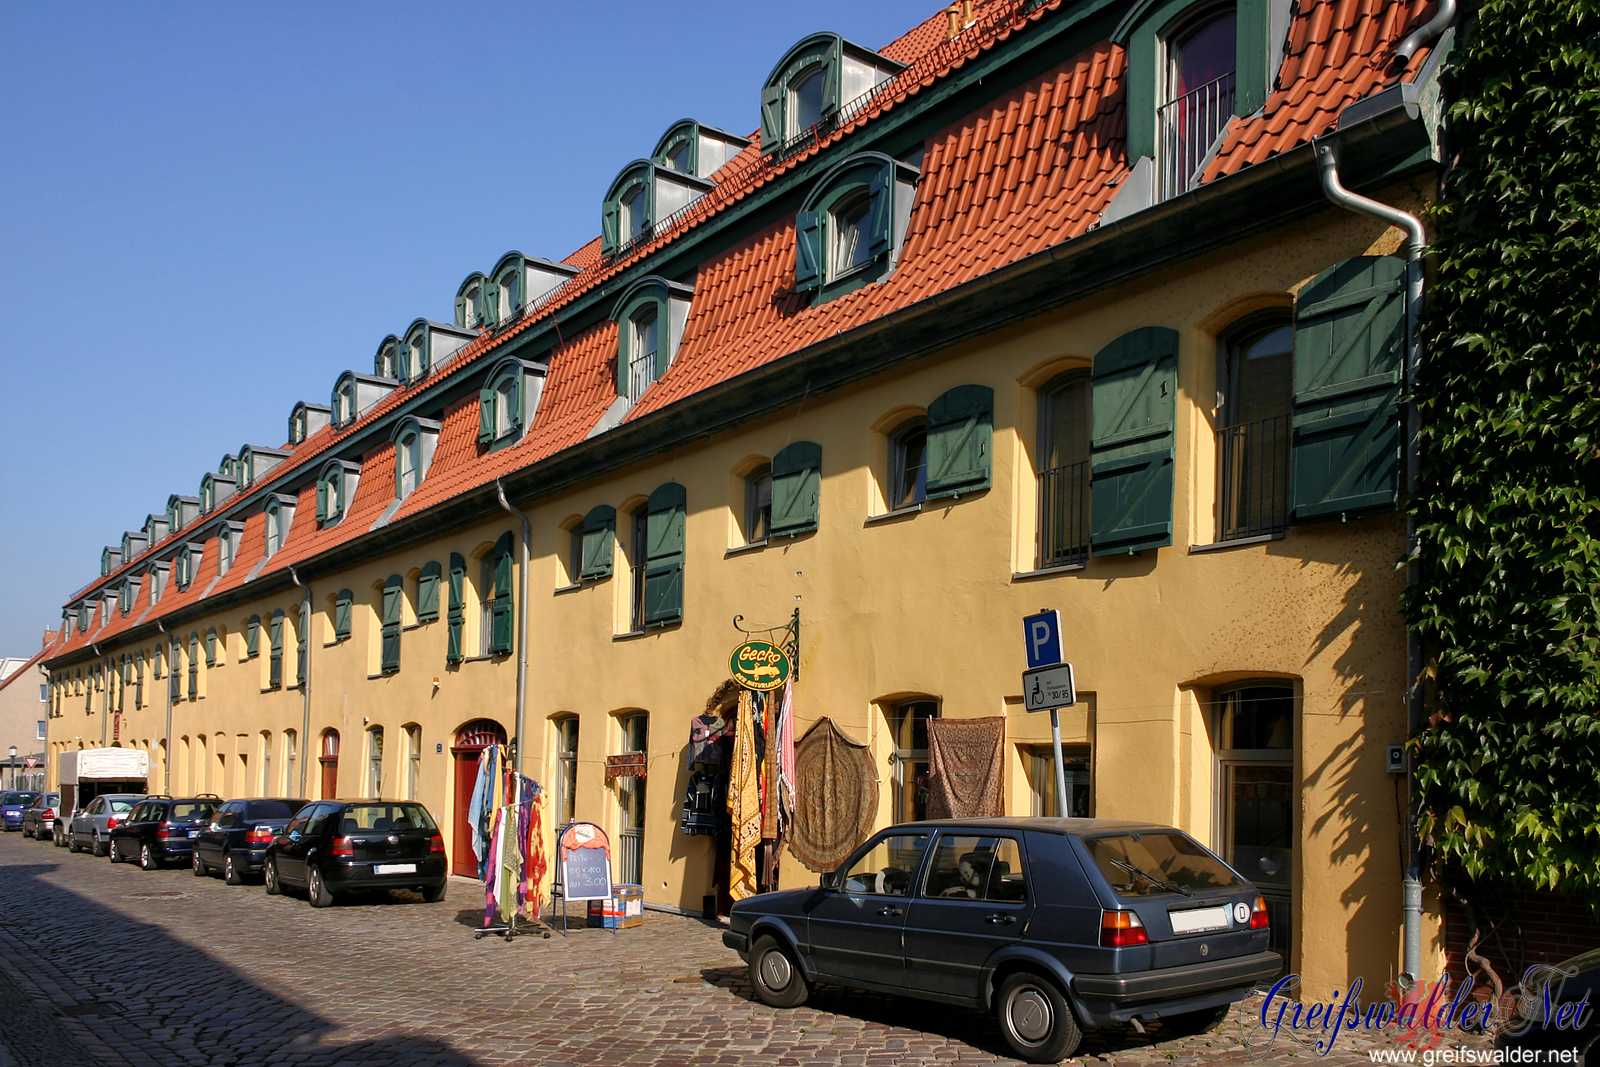 Hunnenstraße, Greifswald, September 2006